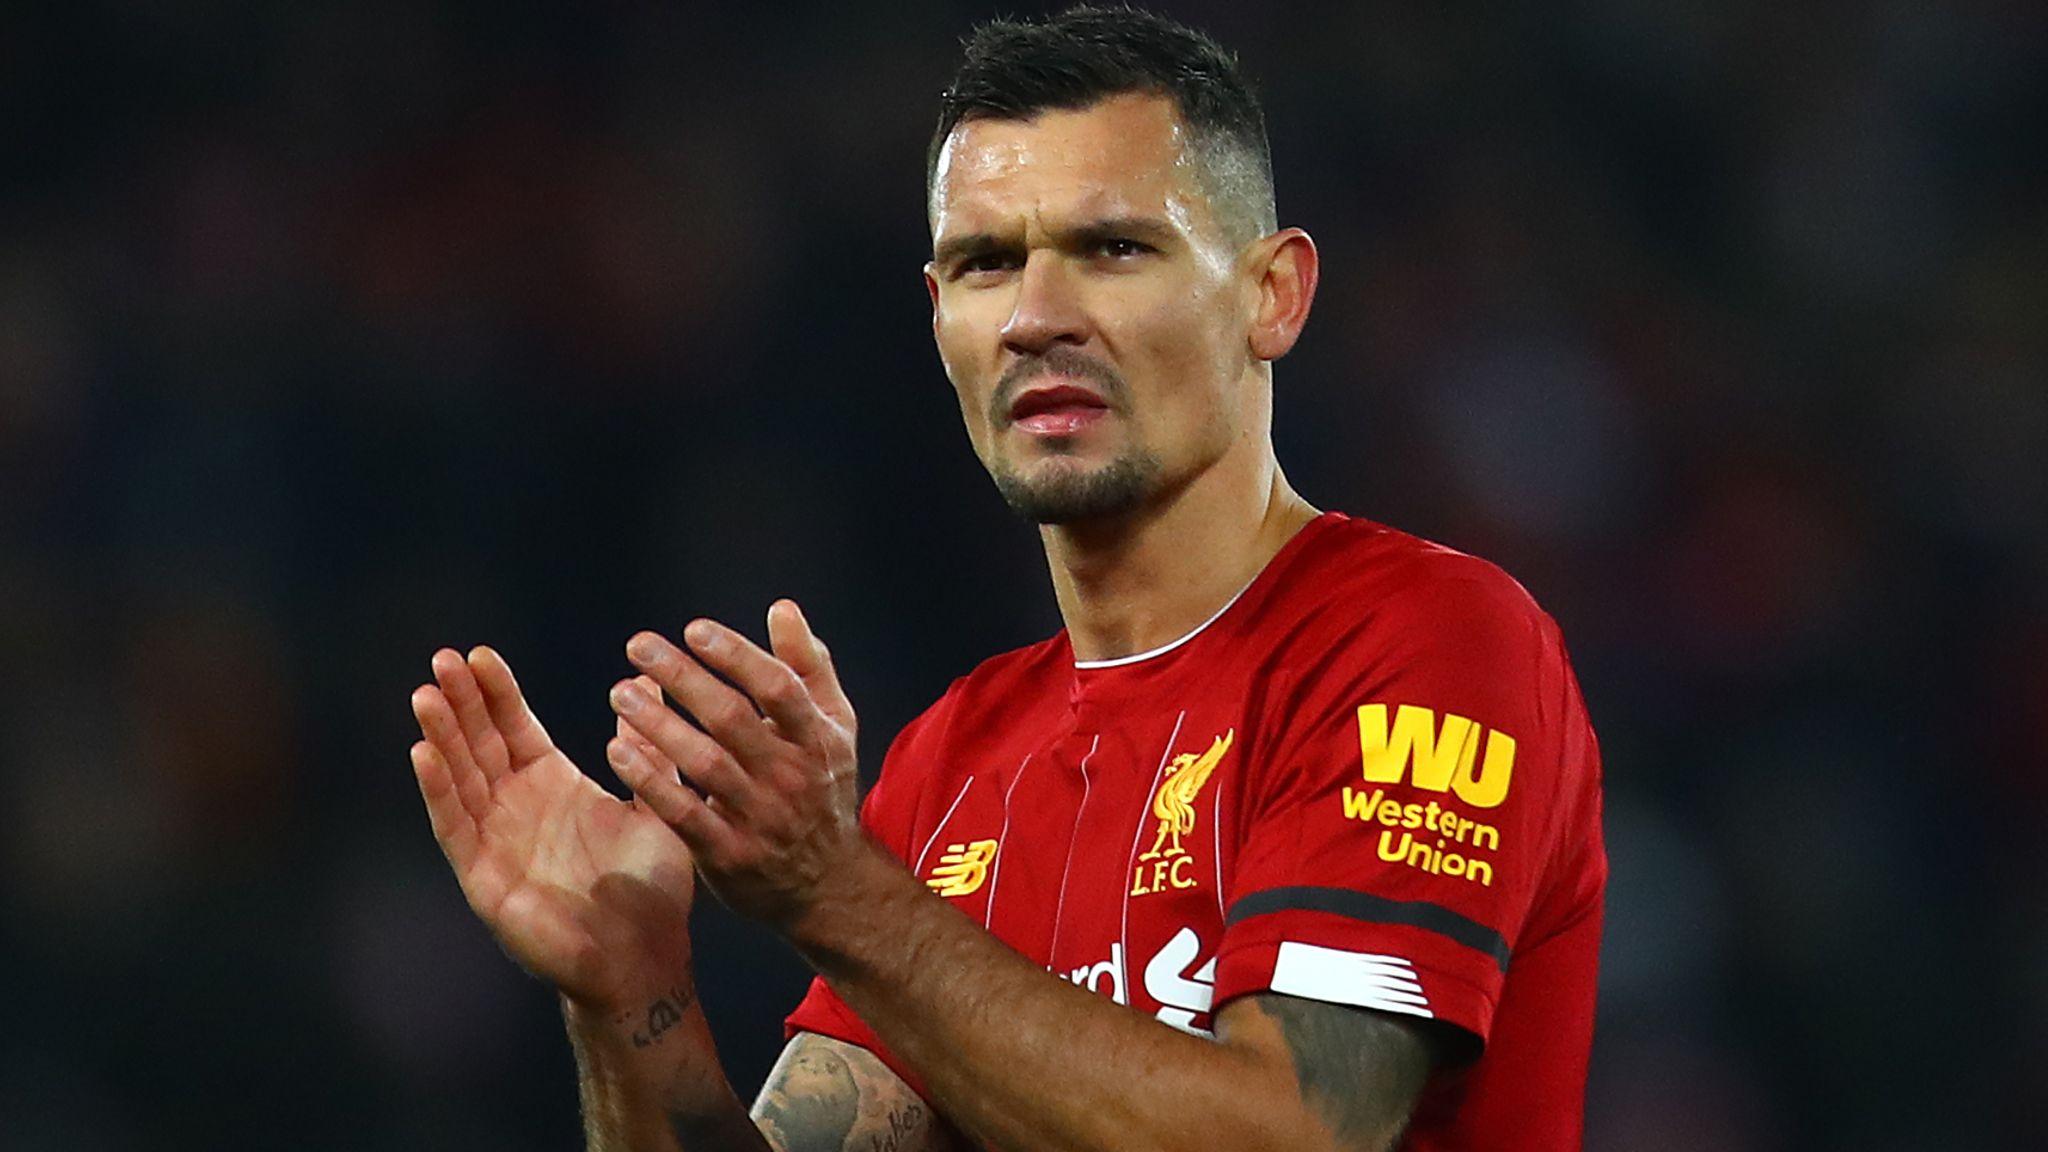 Liverpool's Dejan Lovren trains with squad ahead of Red Bull Salzburg match